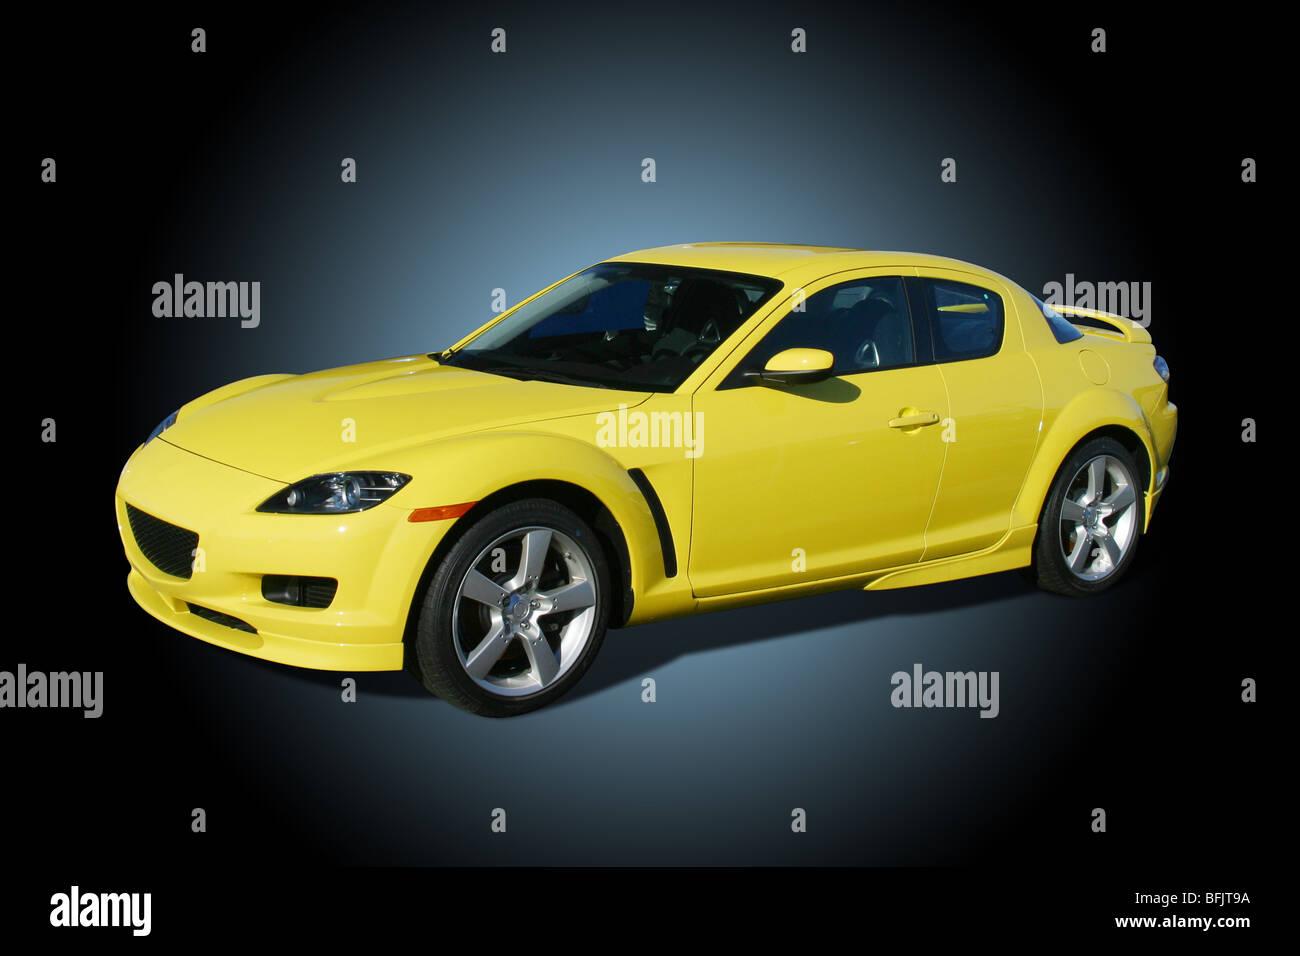 Mazda Yellow Stock Photos & Mazda Yellow Stock Images - Alamy